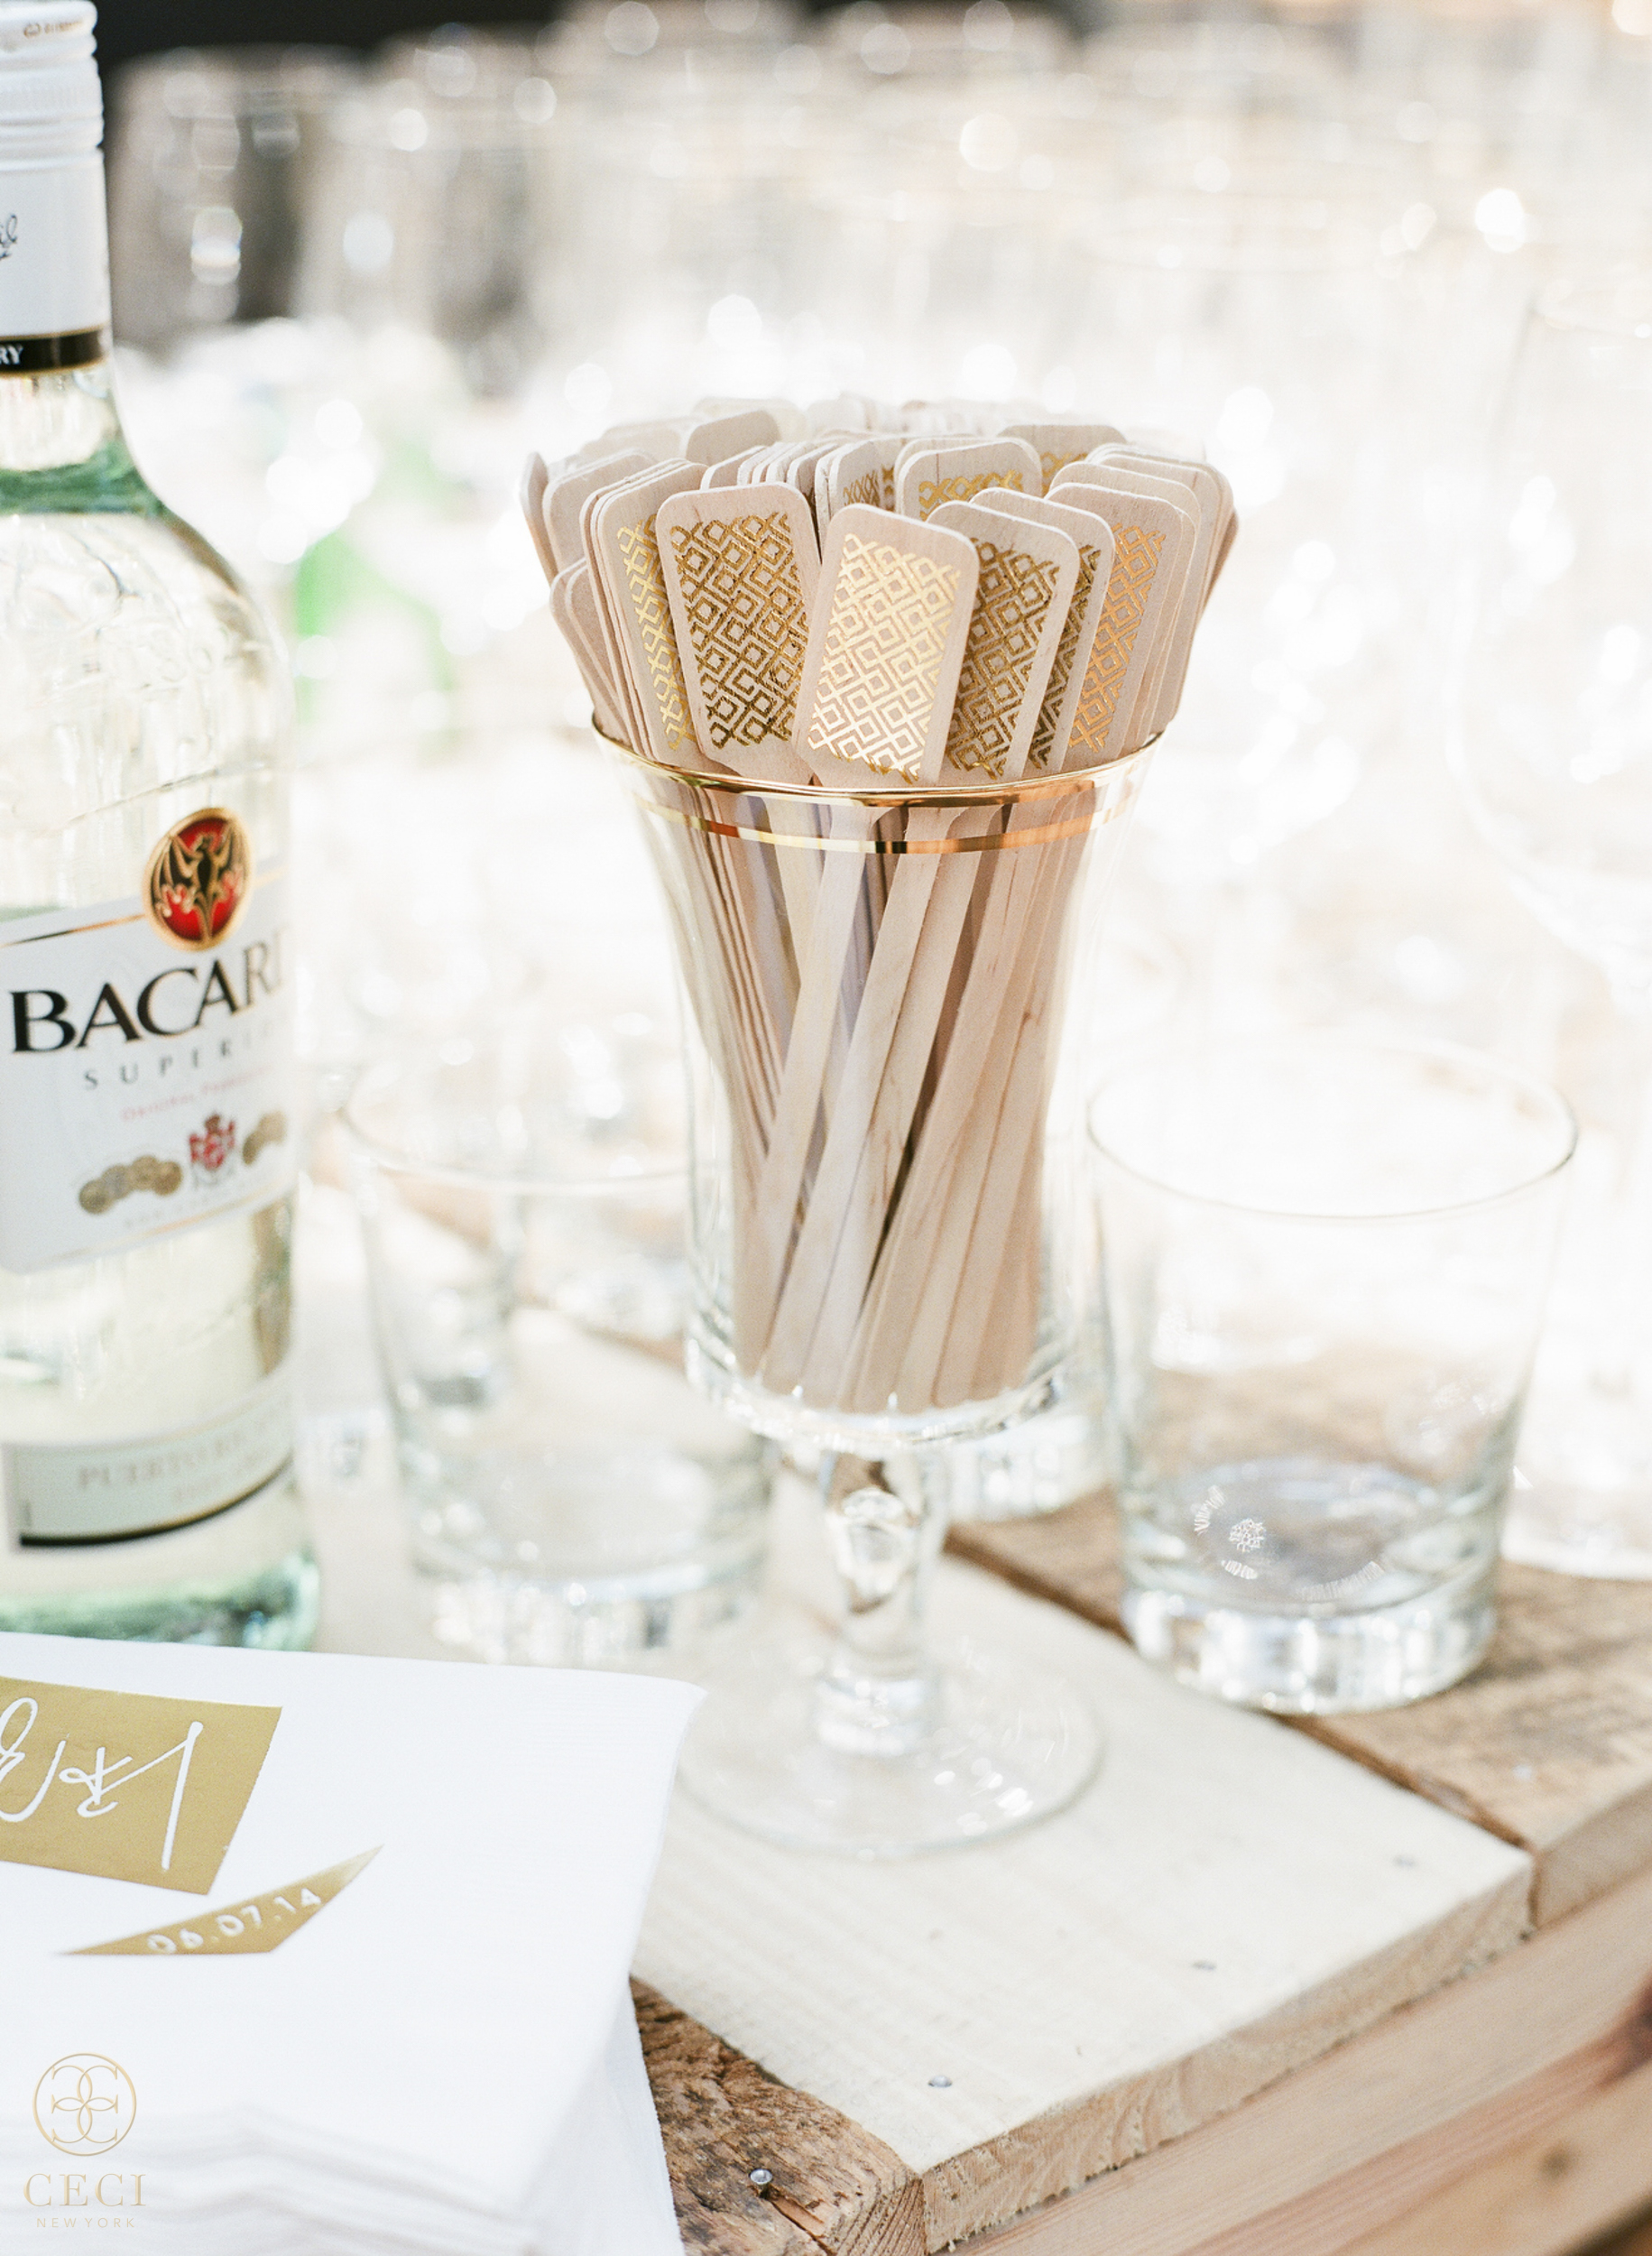 south_carolina_farm_wedding_rustic_chic_surprise_secret_luxe_wedding_bachelorette_emily_maynard_real_weddings_invitation_viewfinder_3D-2.jpg